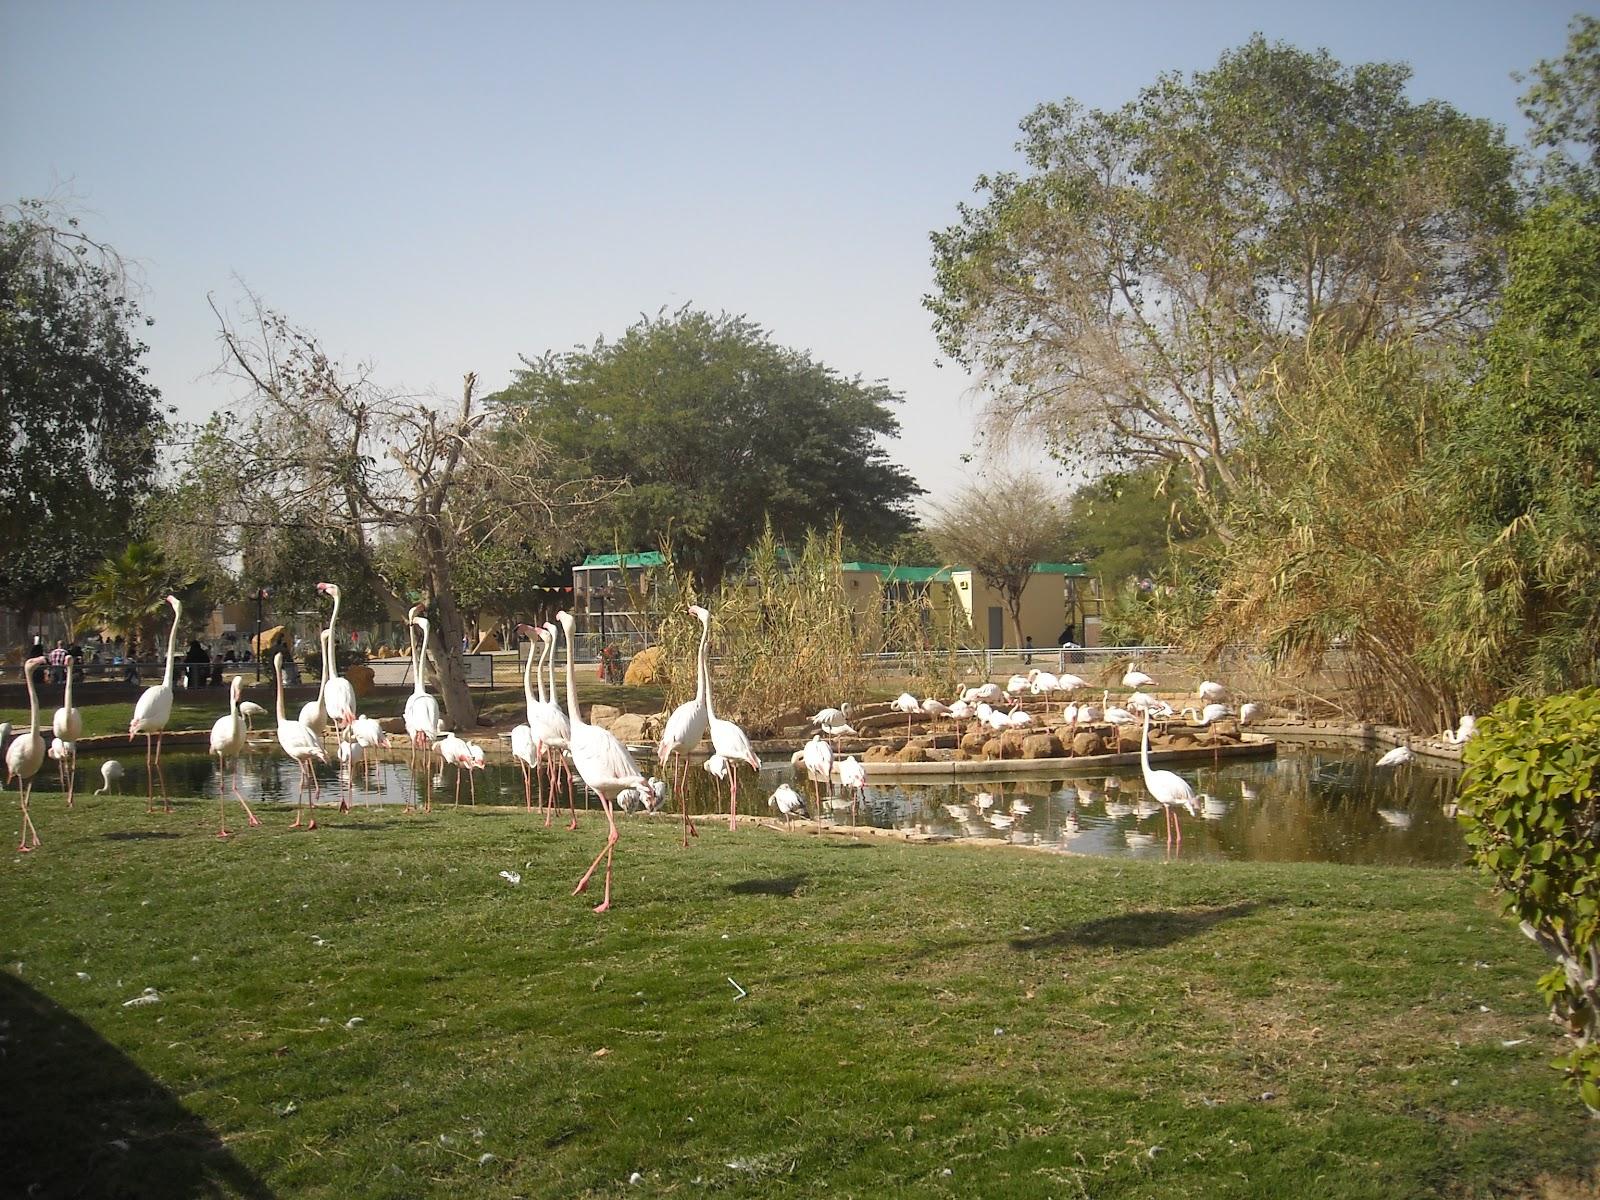 Riyadh Zoo